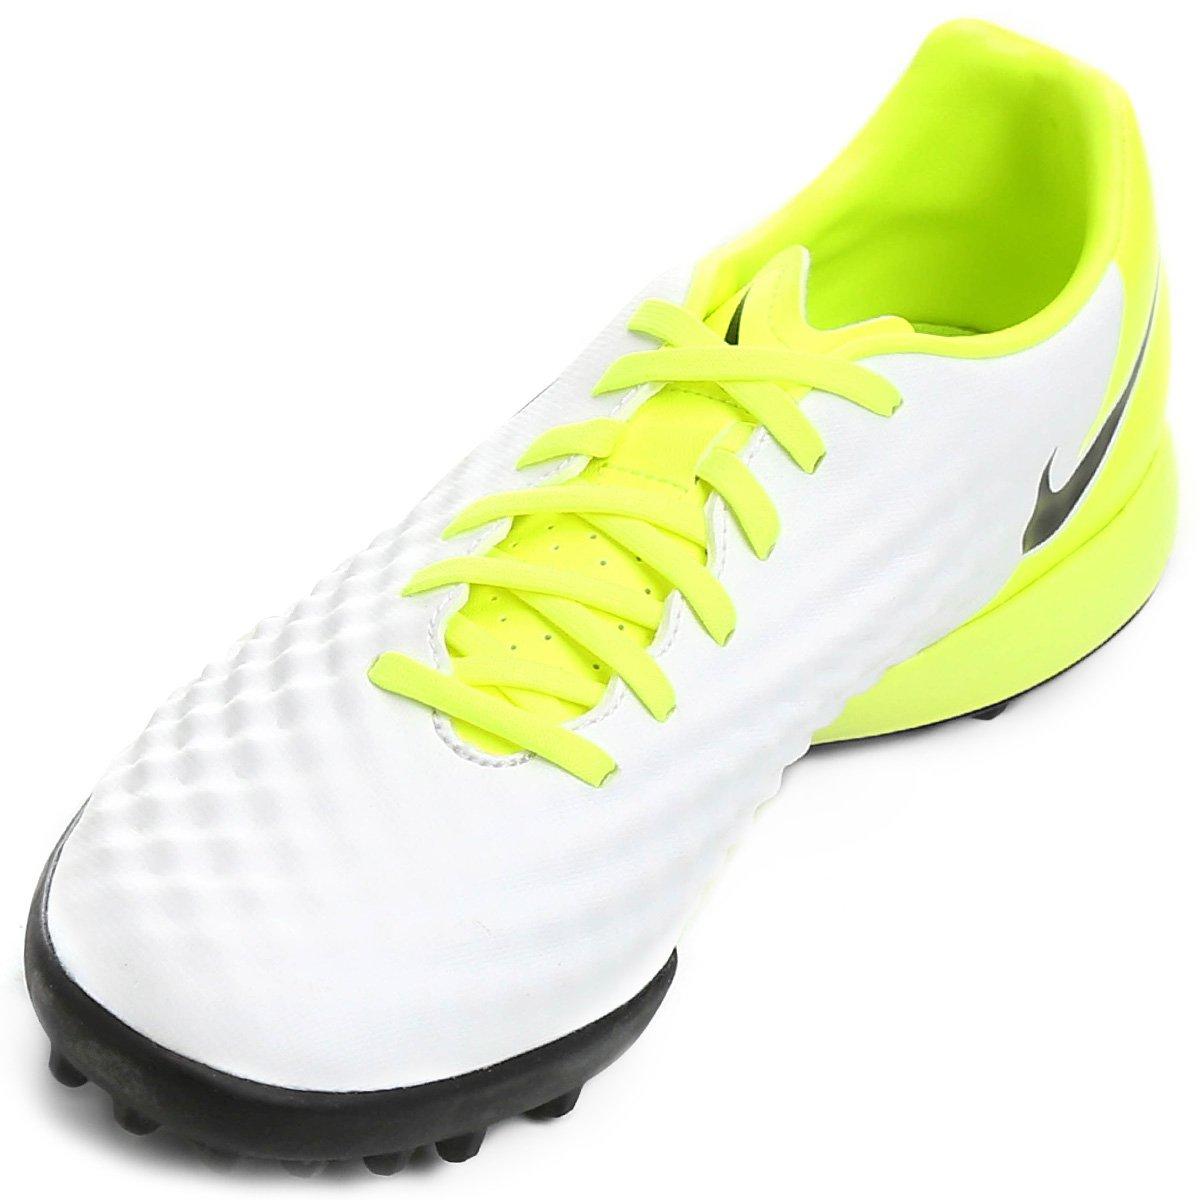 ff28cd5ef1 Chuteira Society Nike Magista Onda II TF - Branco e Preto - Compre ...